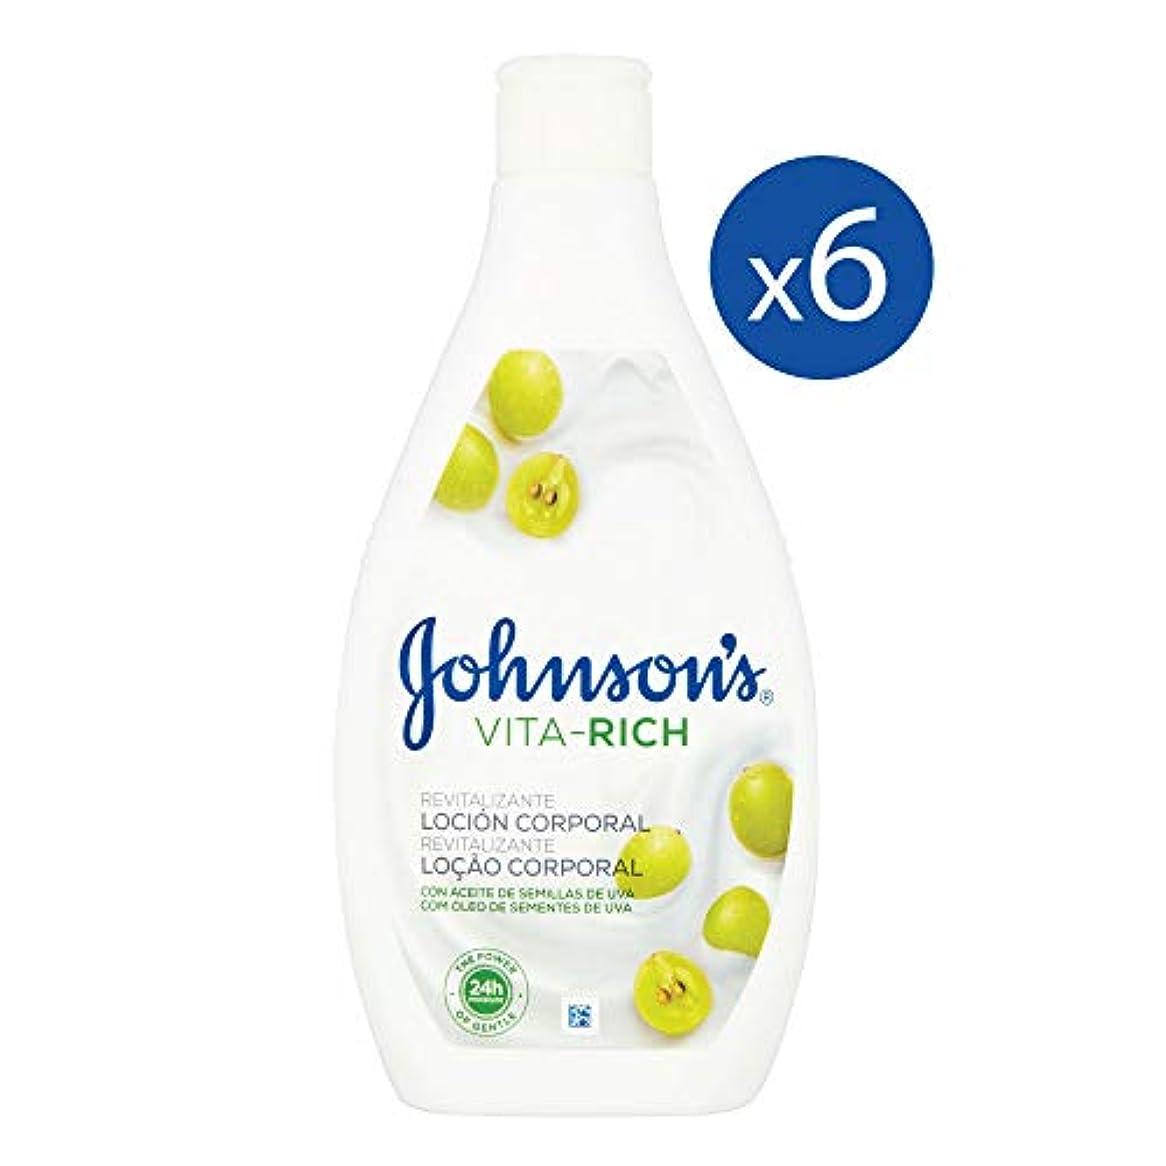 Johnson's VitaリッチリバイタリザンテUvas Body Lotion、400 ml